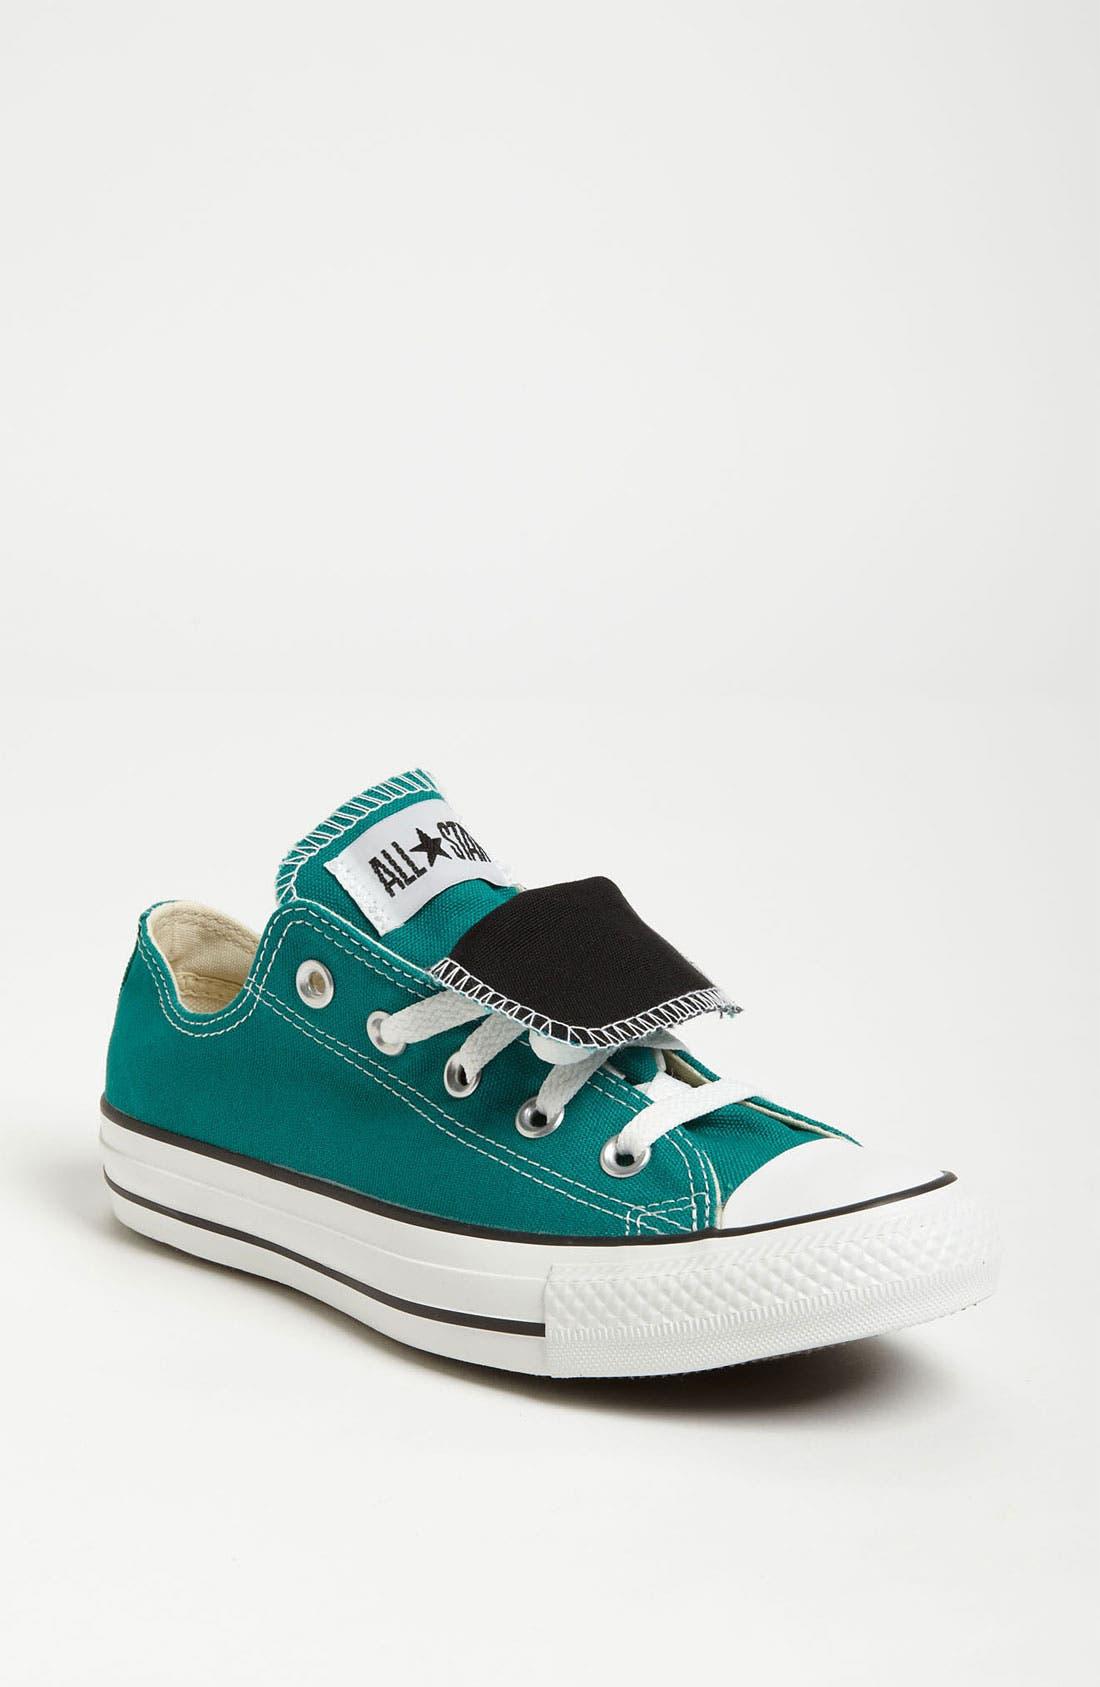 Alternate Image 1 Selected - Converse Chuck Taylor® Double Tongue Sneaker (Women)